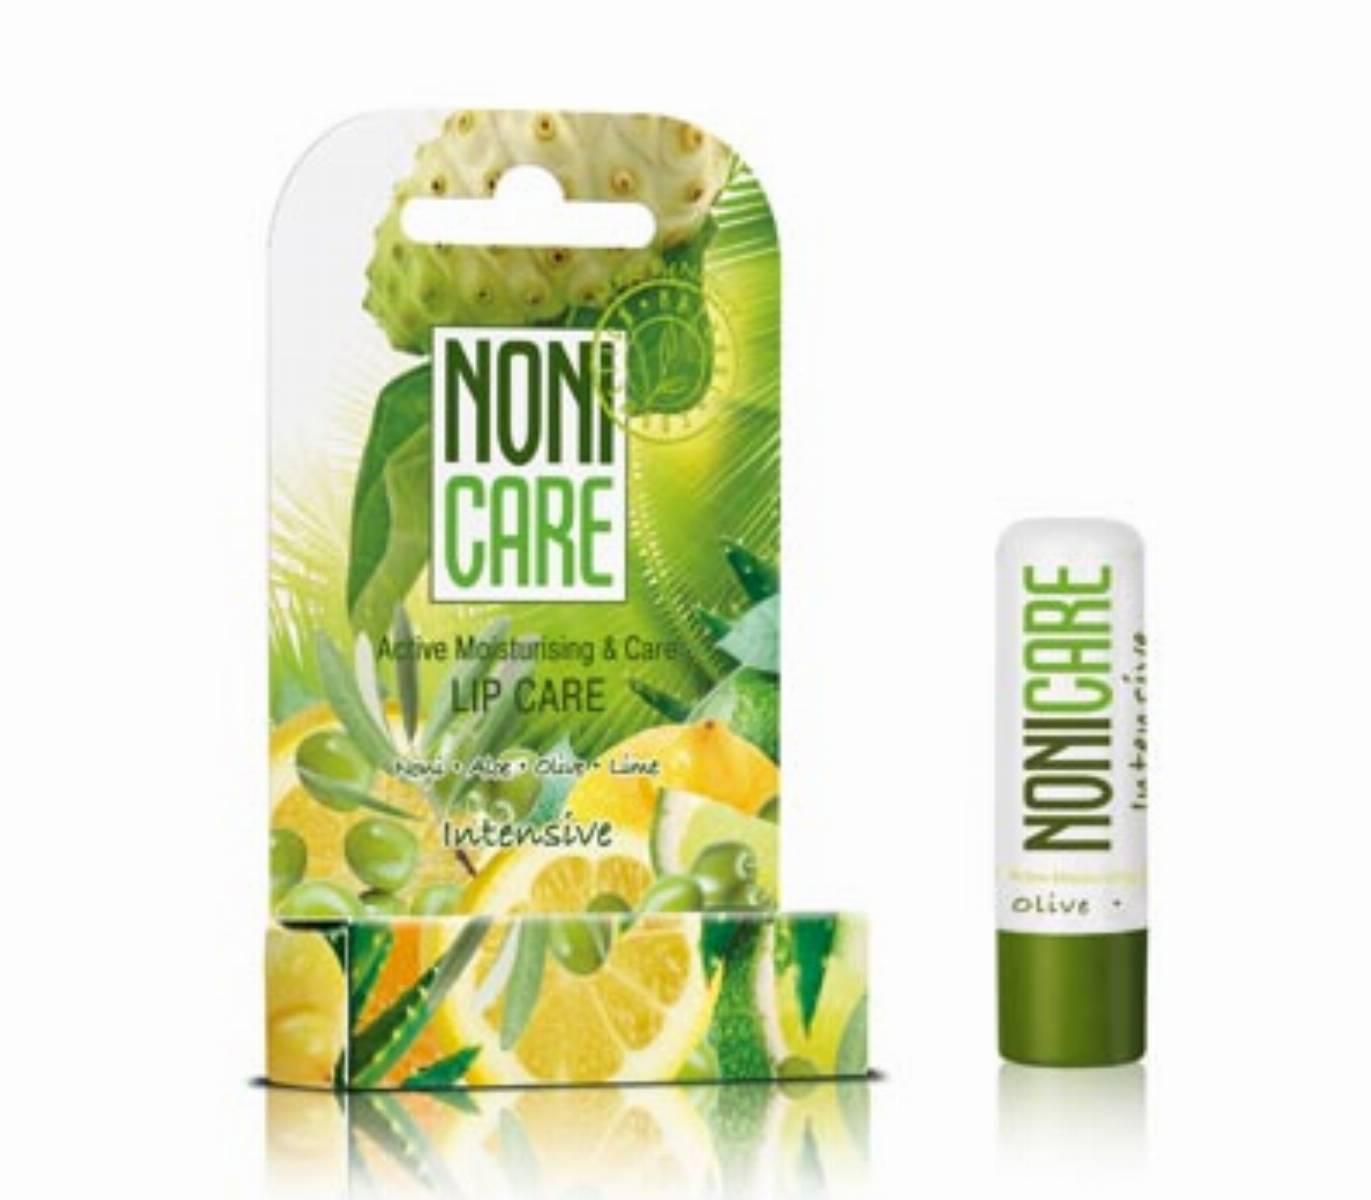 Pomadka ochronna Noni Care Intensive Active Moisturising & Care